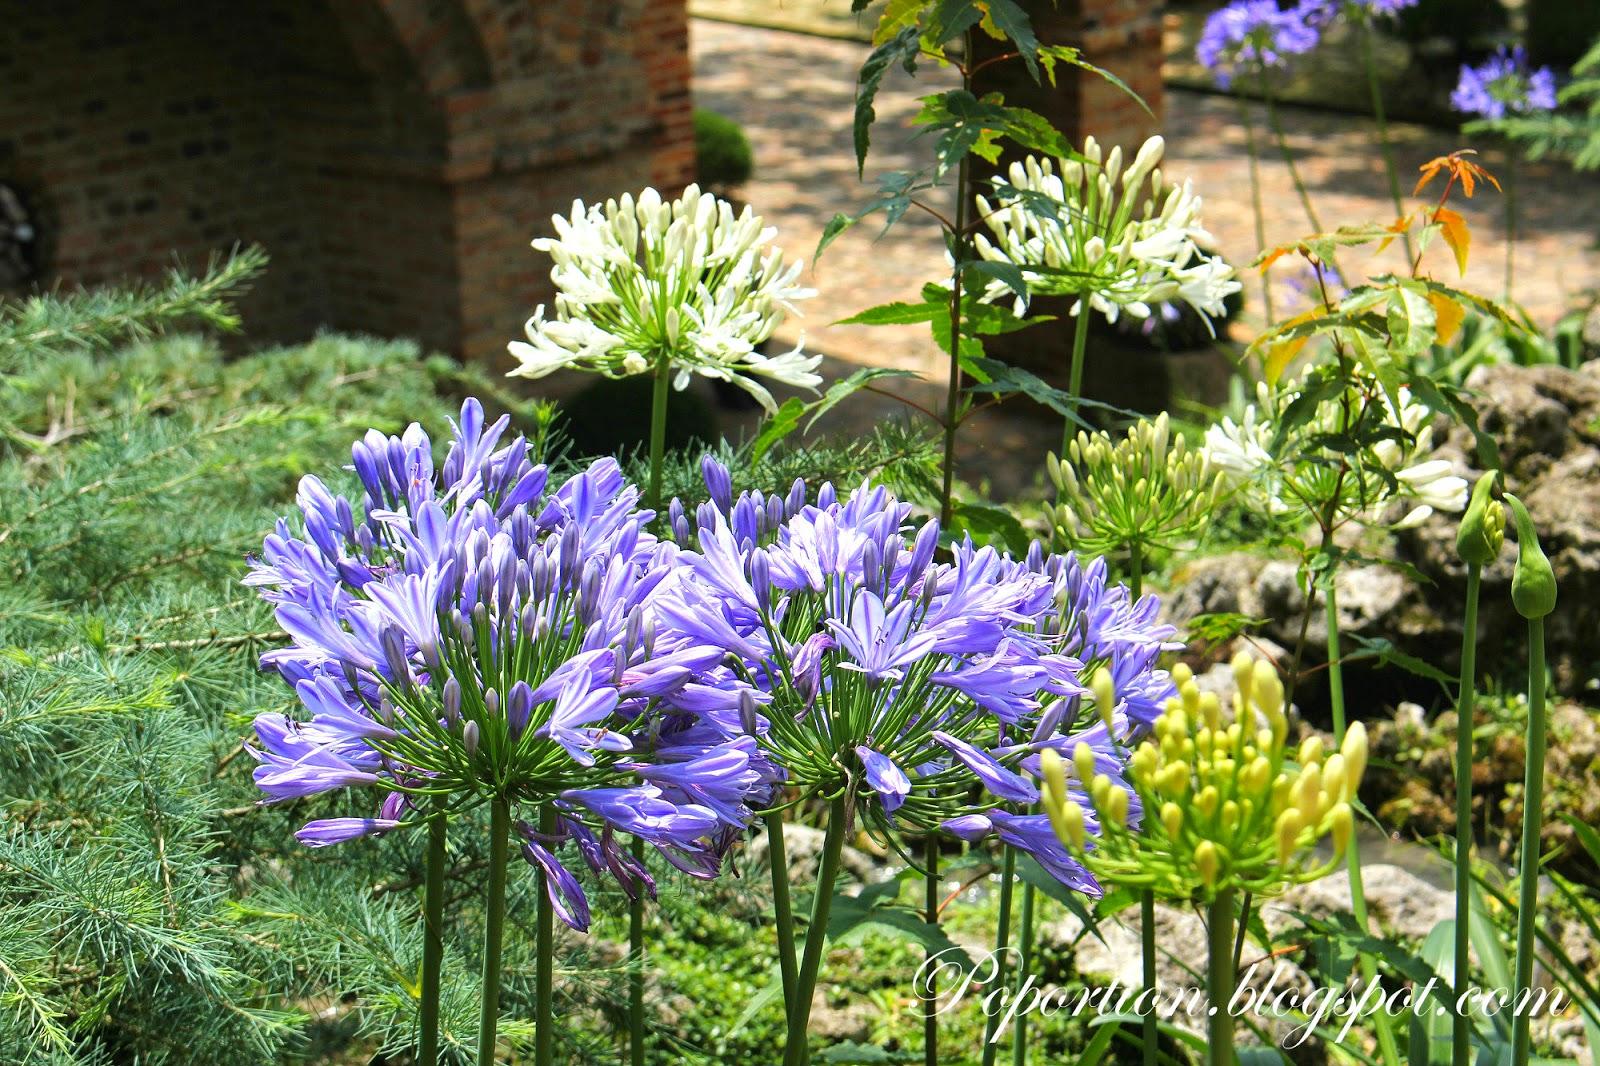 purple flowers bloom